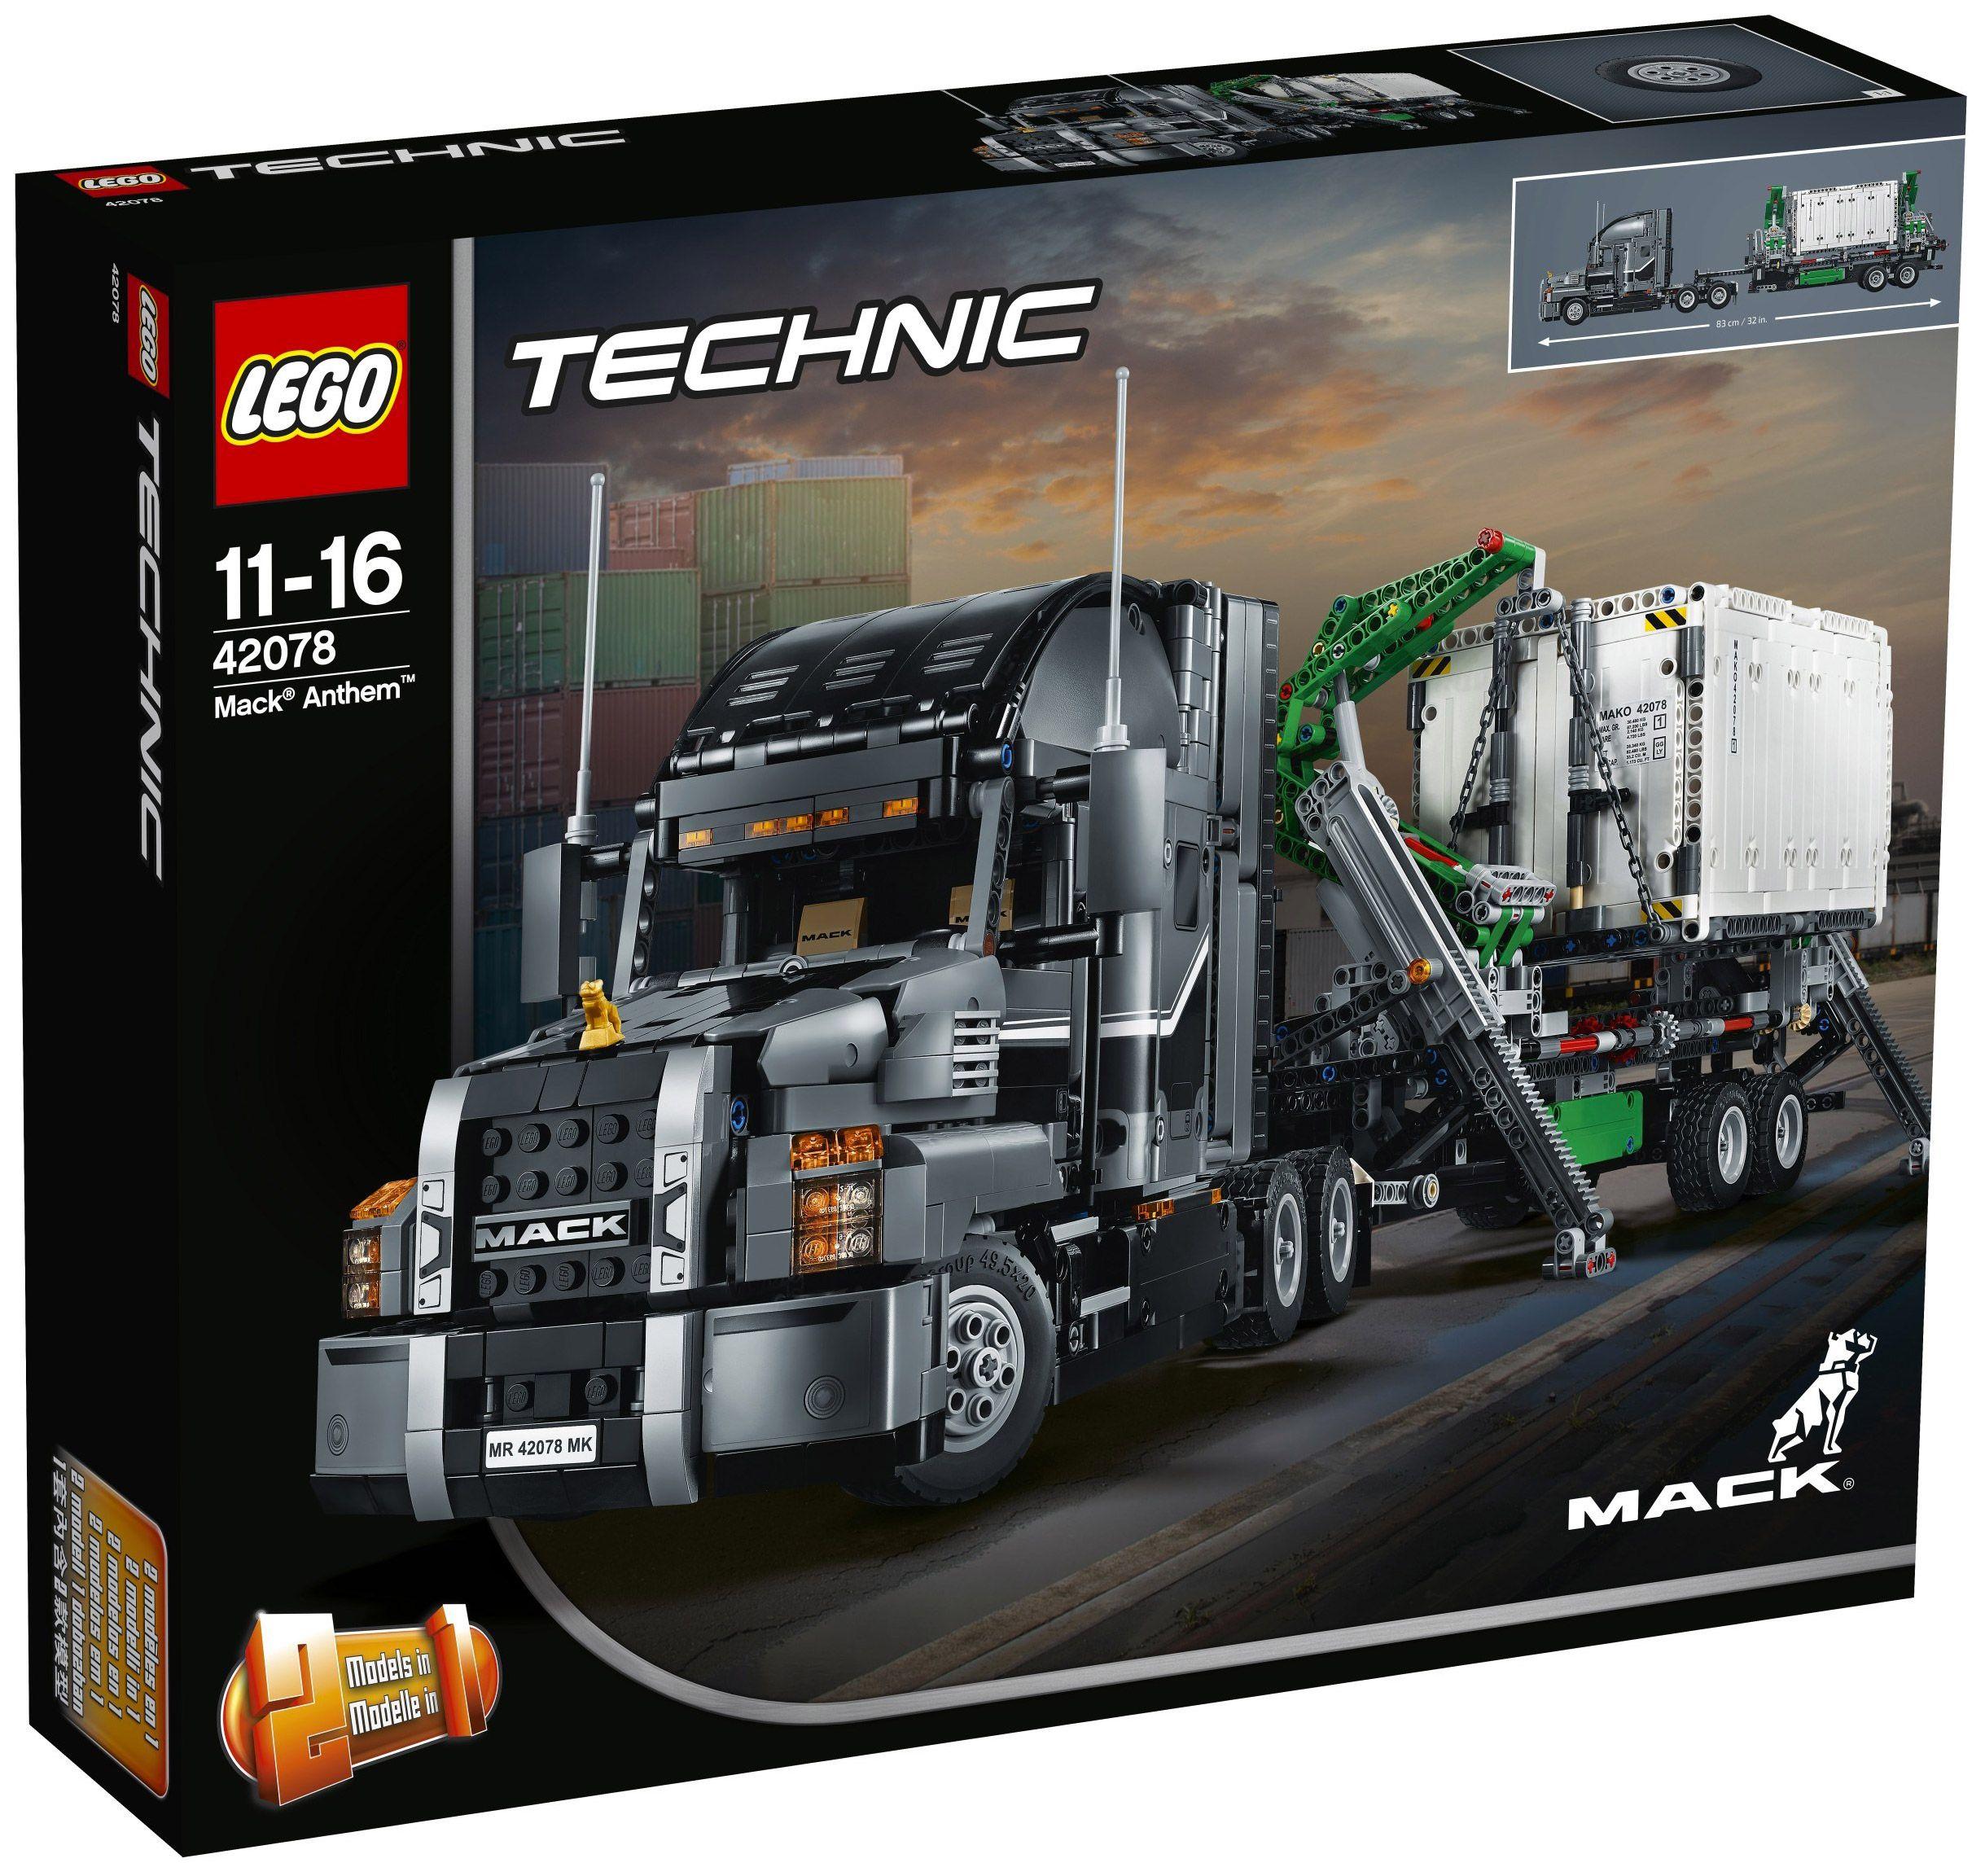 lego technic 42078 mack anthem lego technic pinterest l go lego et vehicule. Black Bedroom Furniture Sets. Home Design Ideas